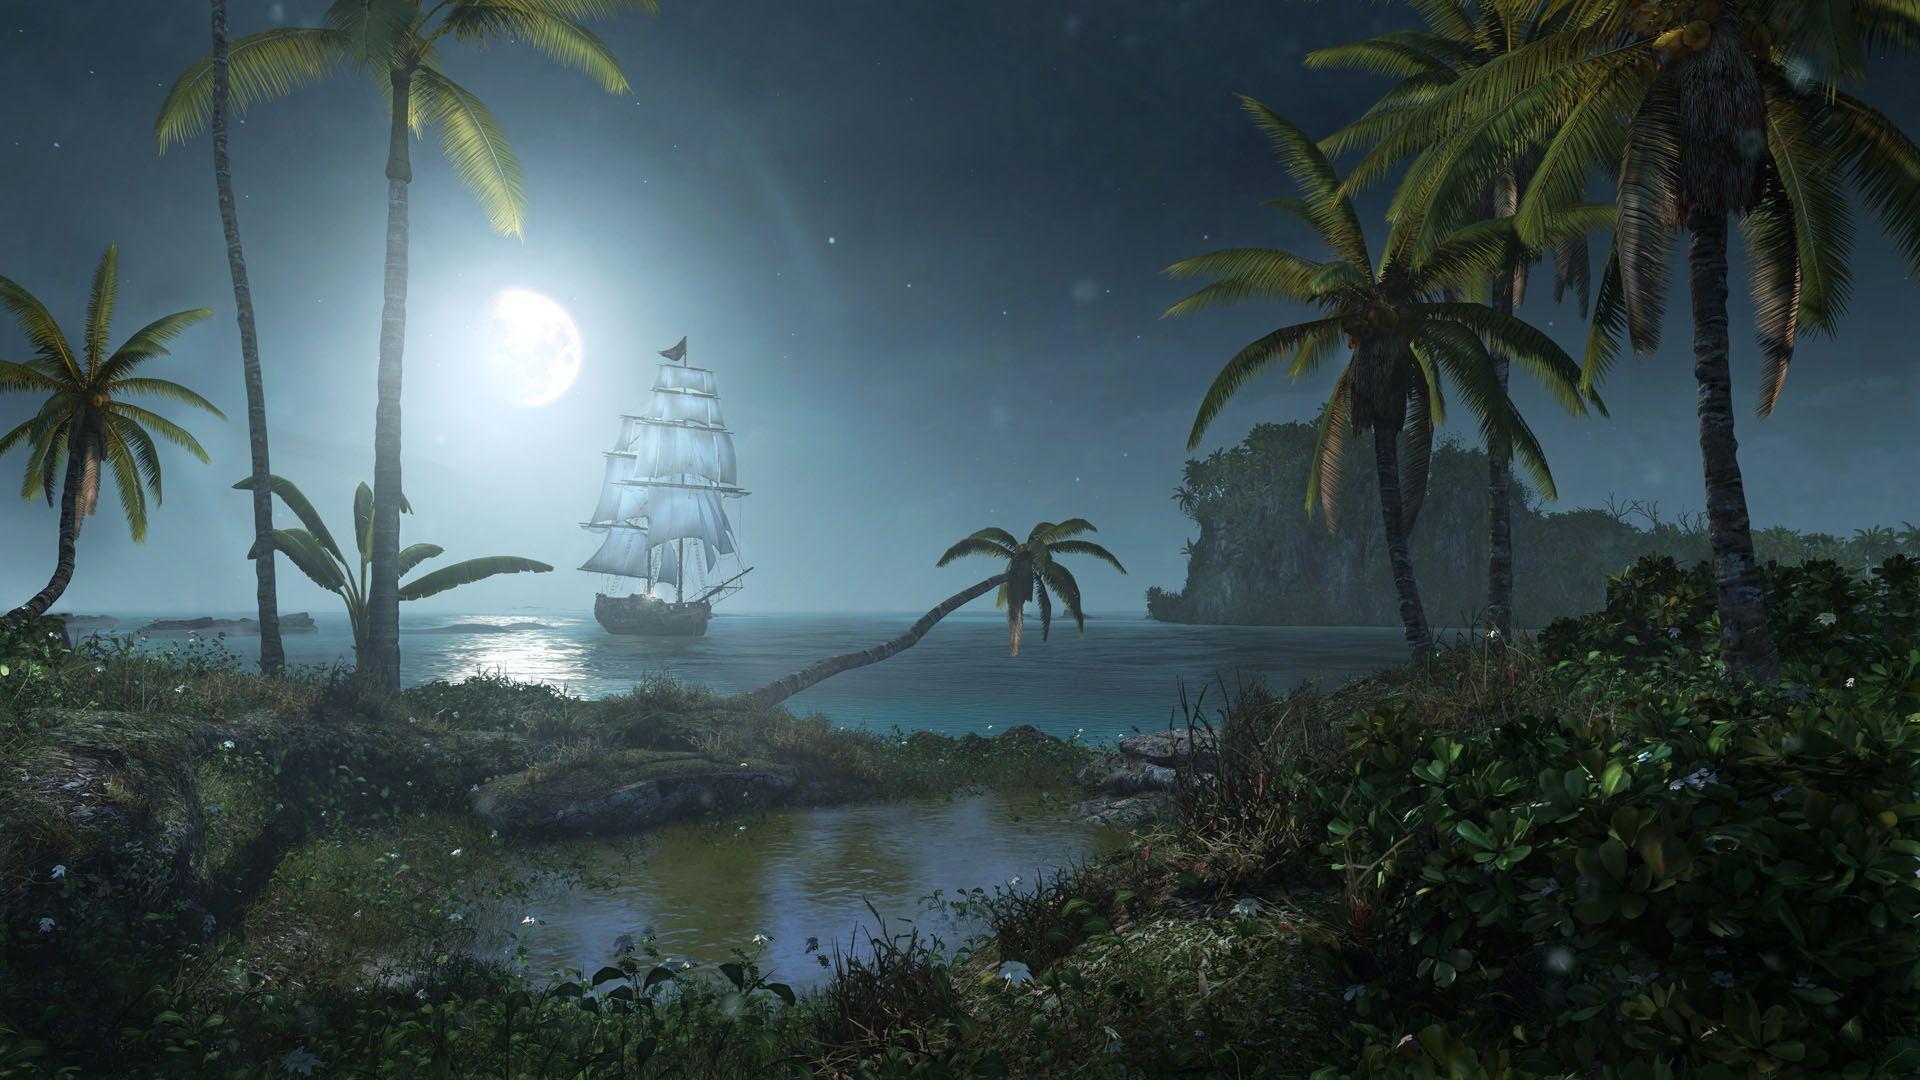 Caribbean Night Wallpapers Top Free Caribbean Night Backgrounds Wallpaperaccess